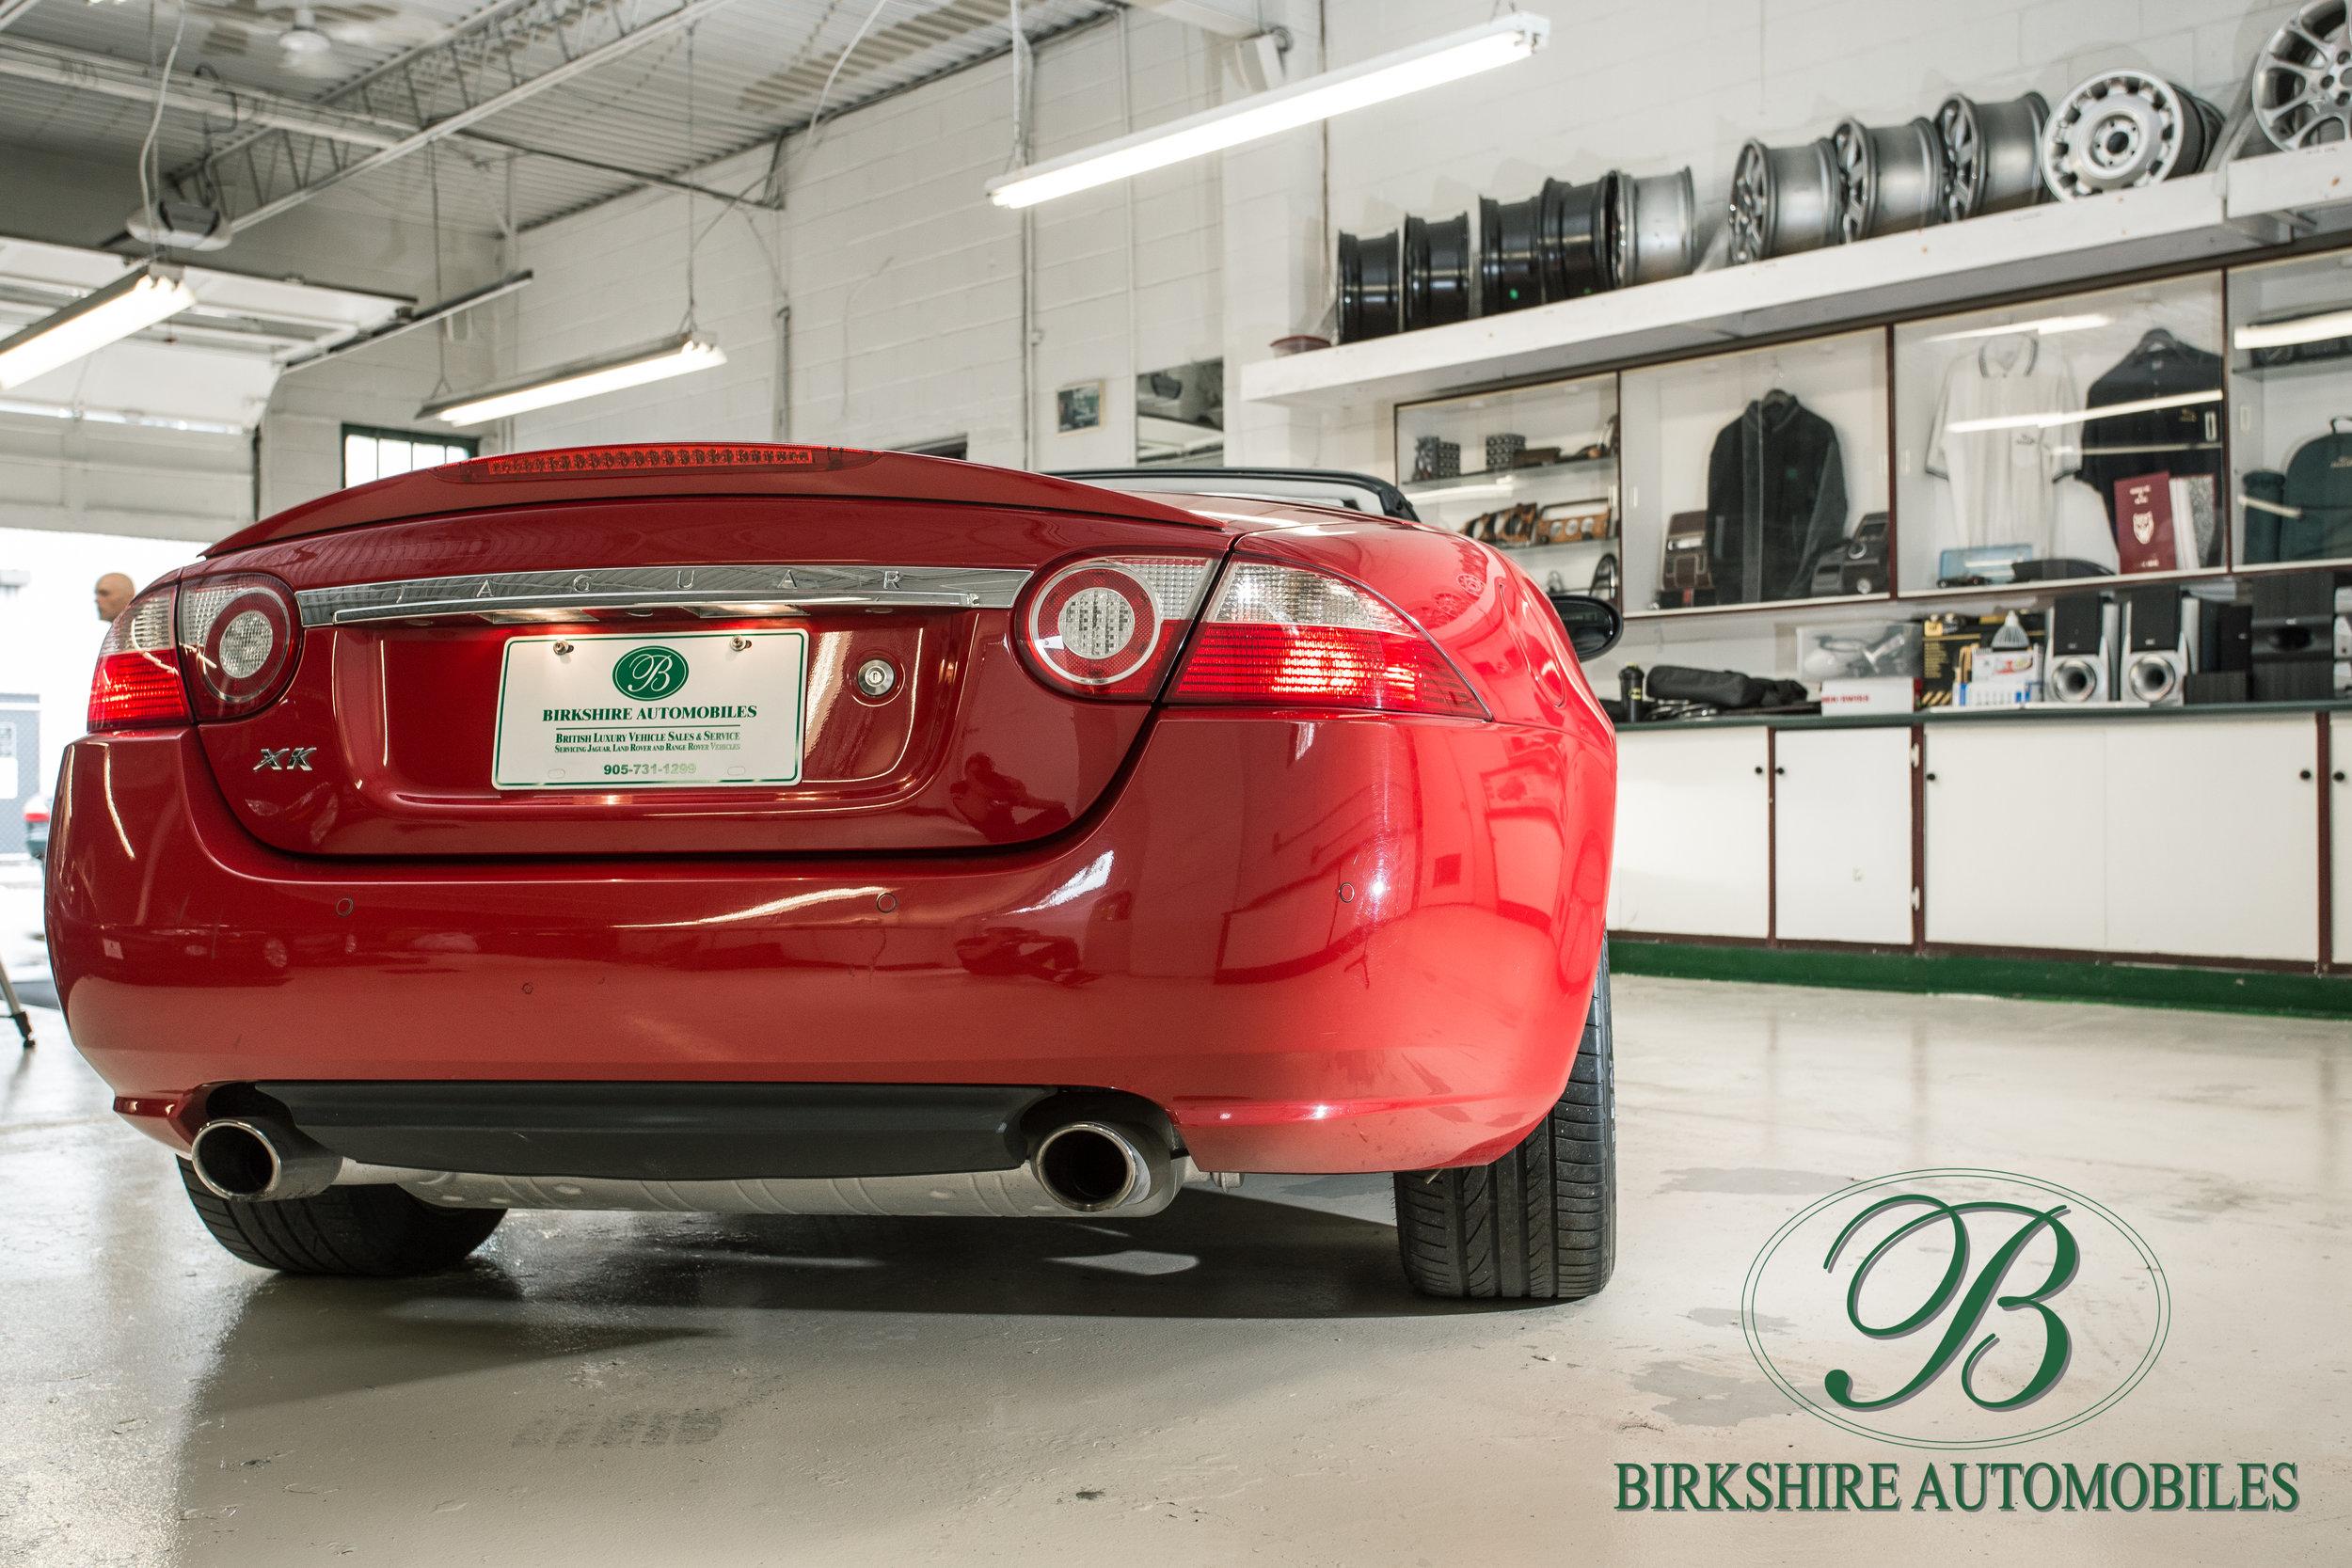 Birkshire Automobiles-81.jpg